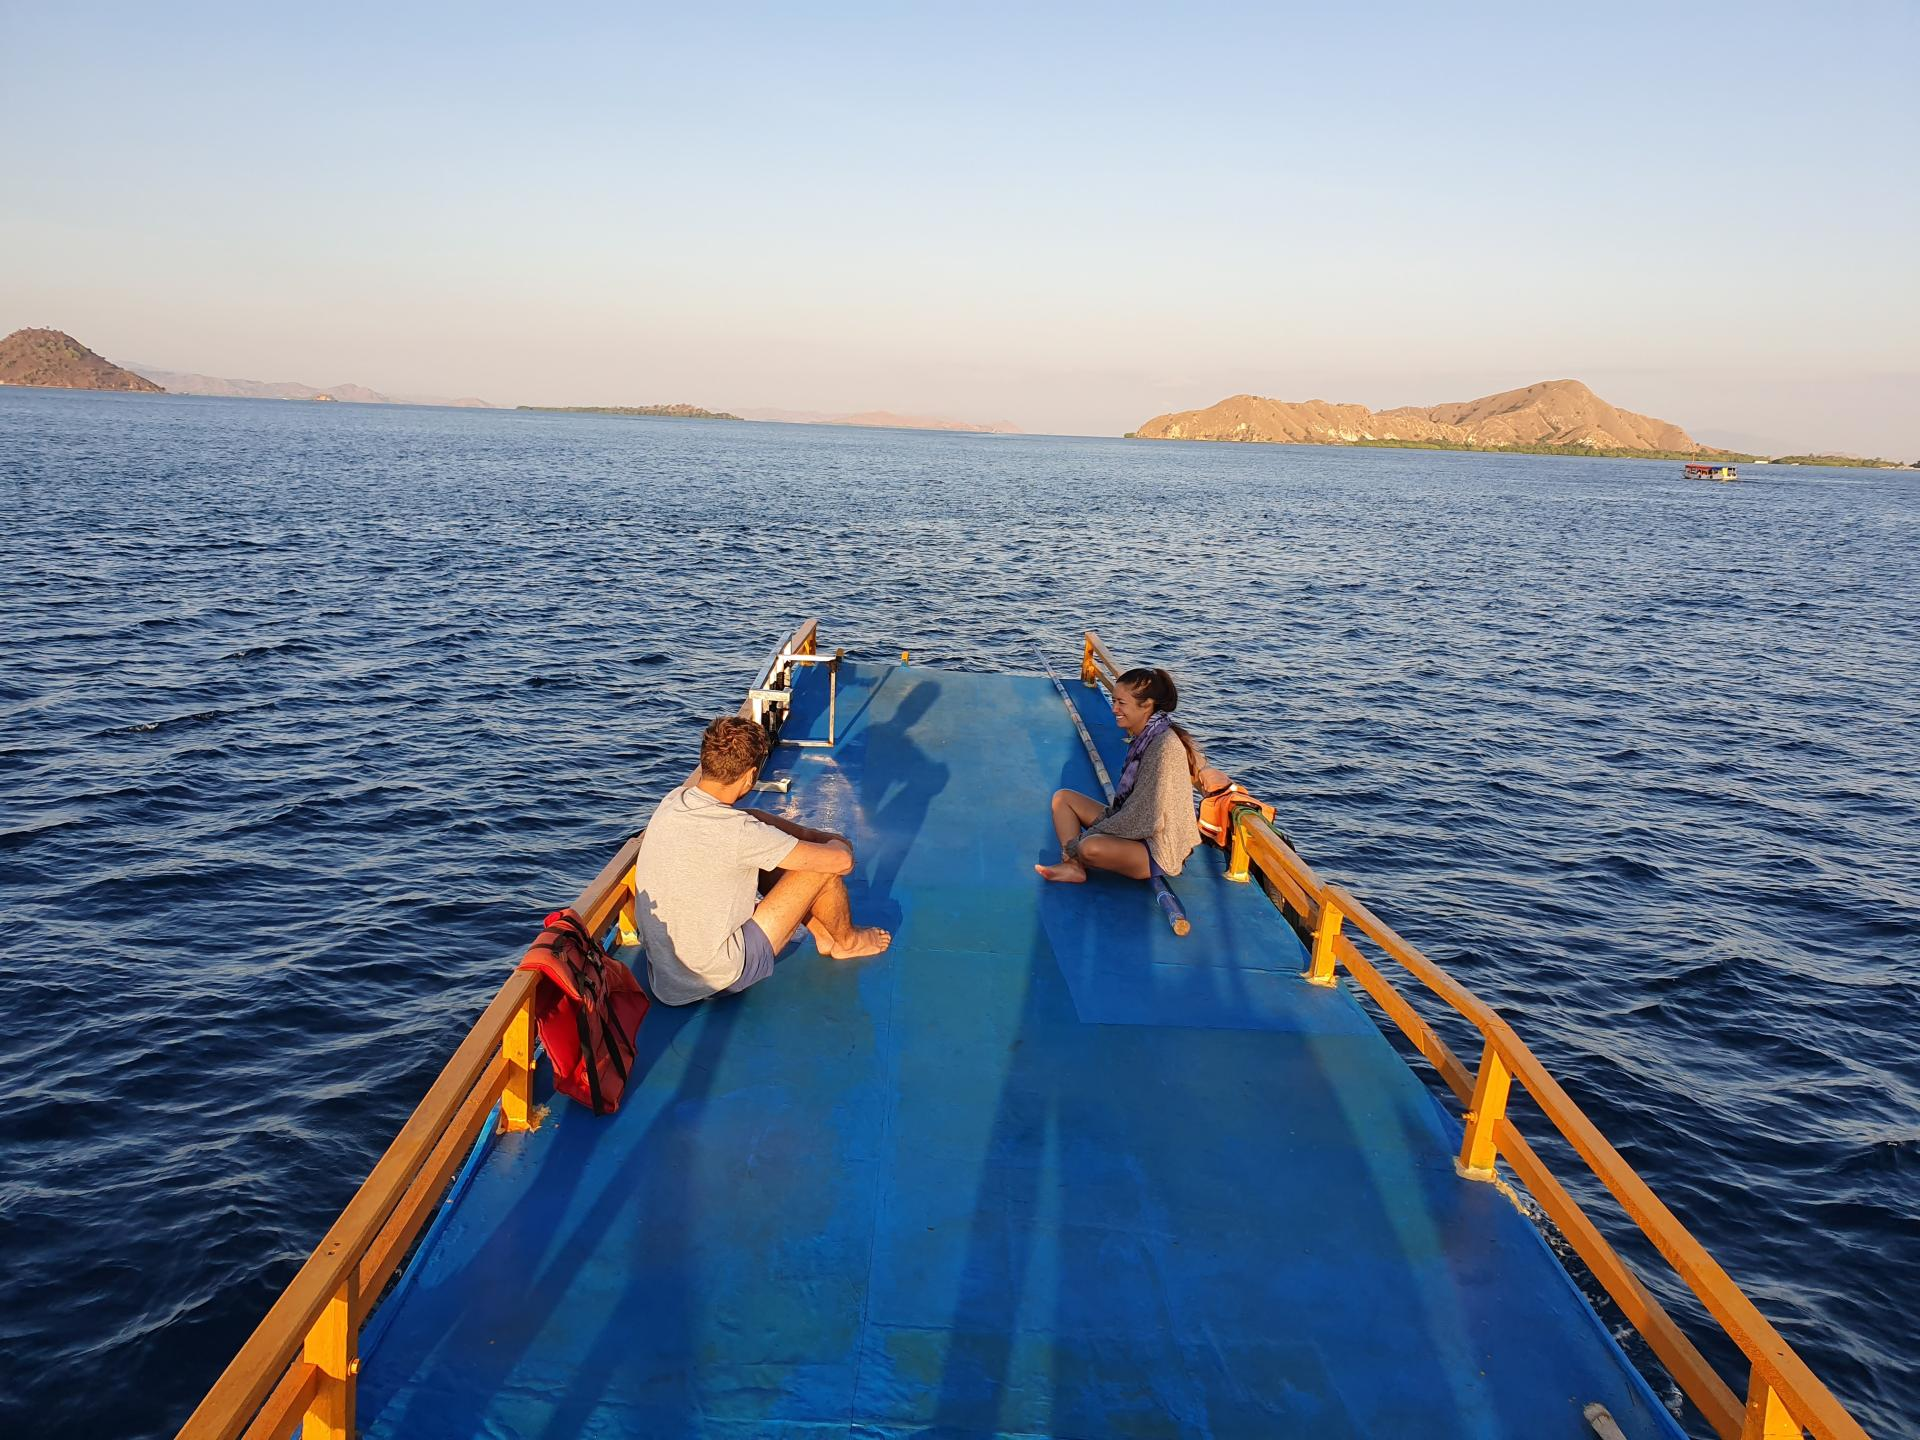 верхняя палуба индонезийского судна